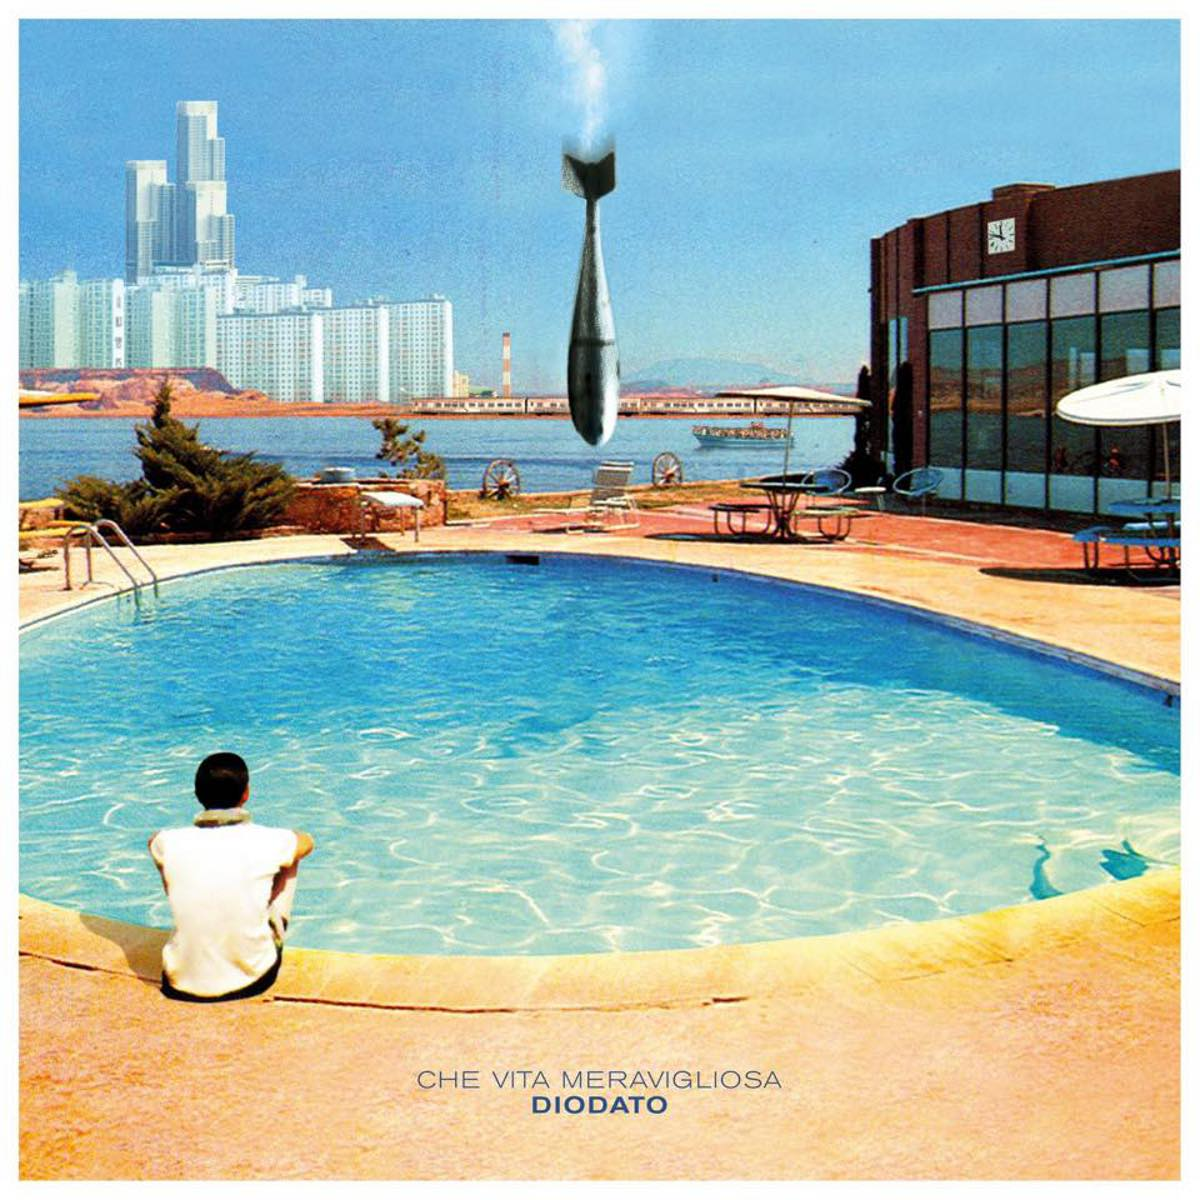 Che Vita Meravigliosa Diodato Album 2020 copertina